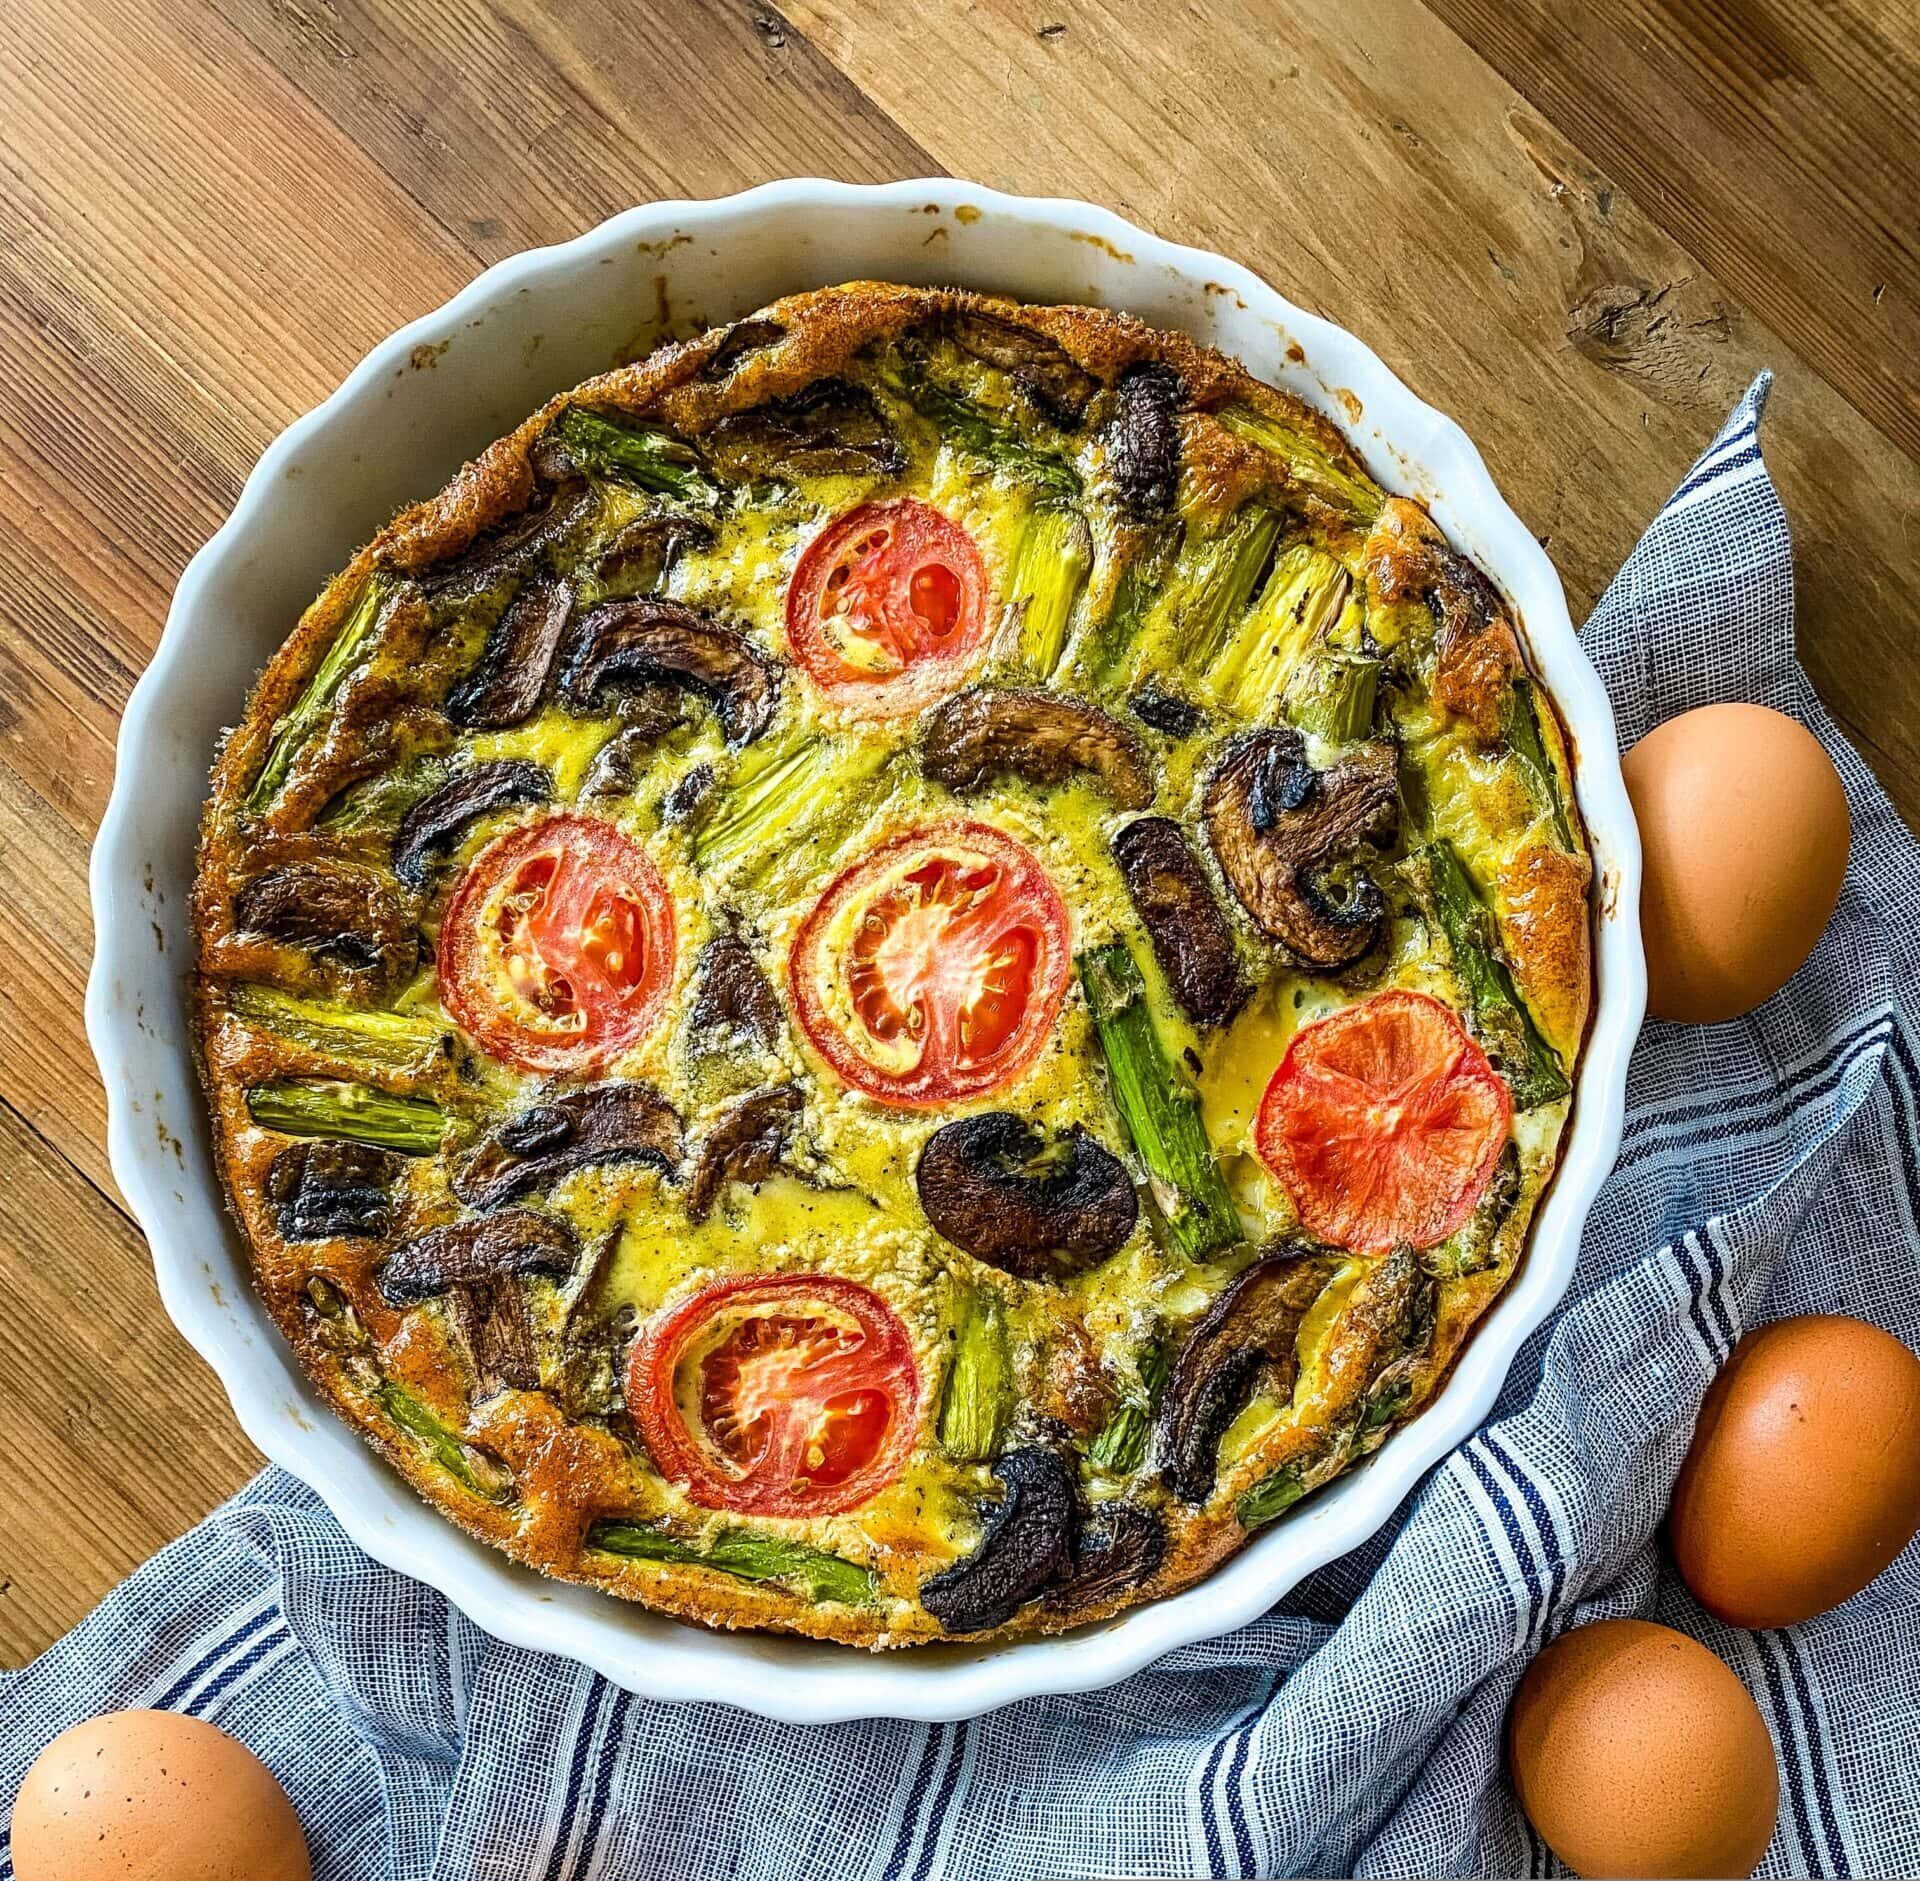 Healthy Mushroom, Asparagus, And Tomato Frittata